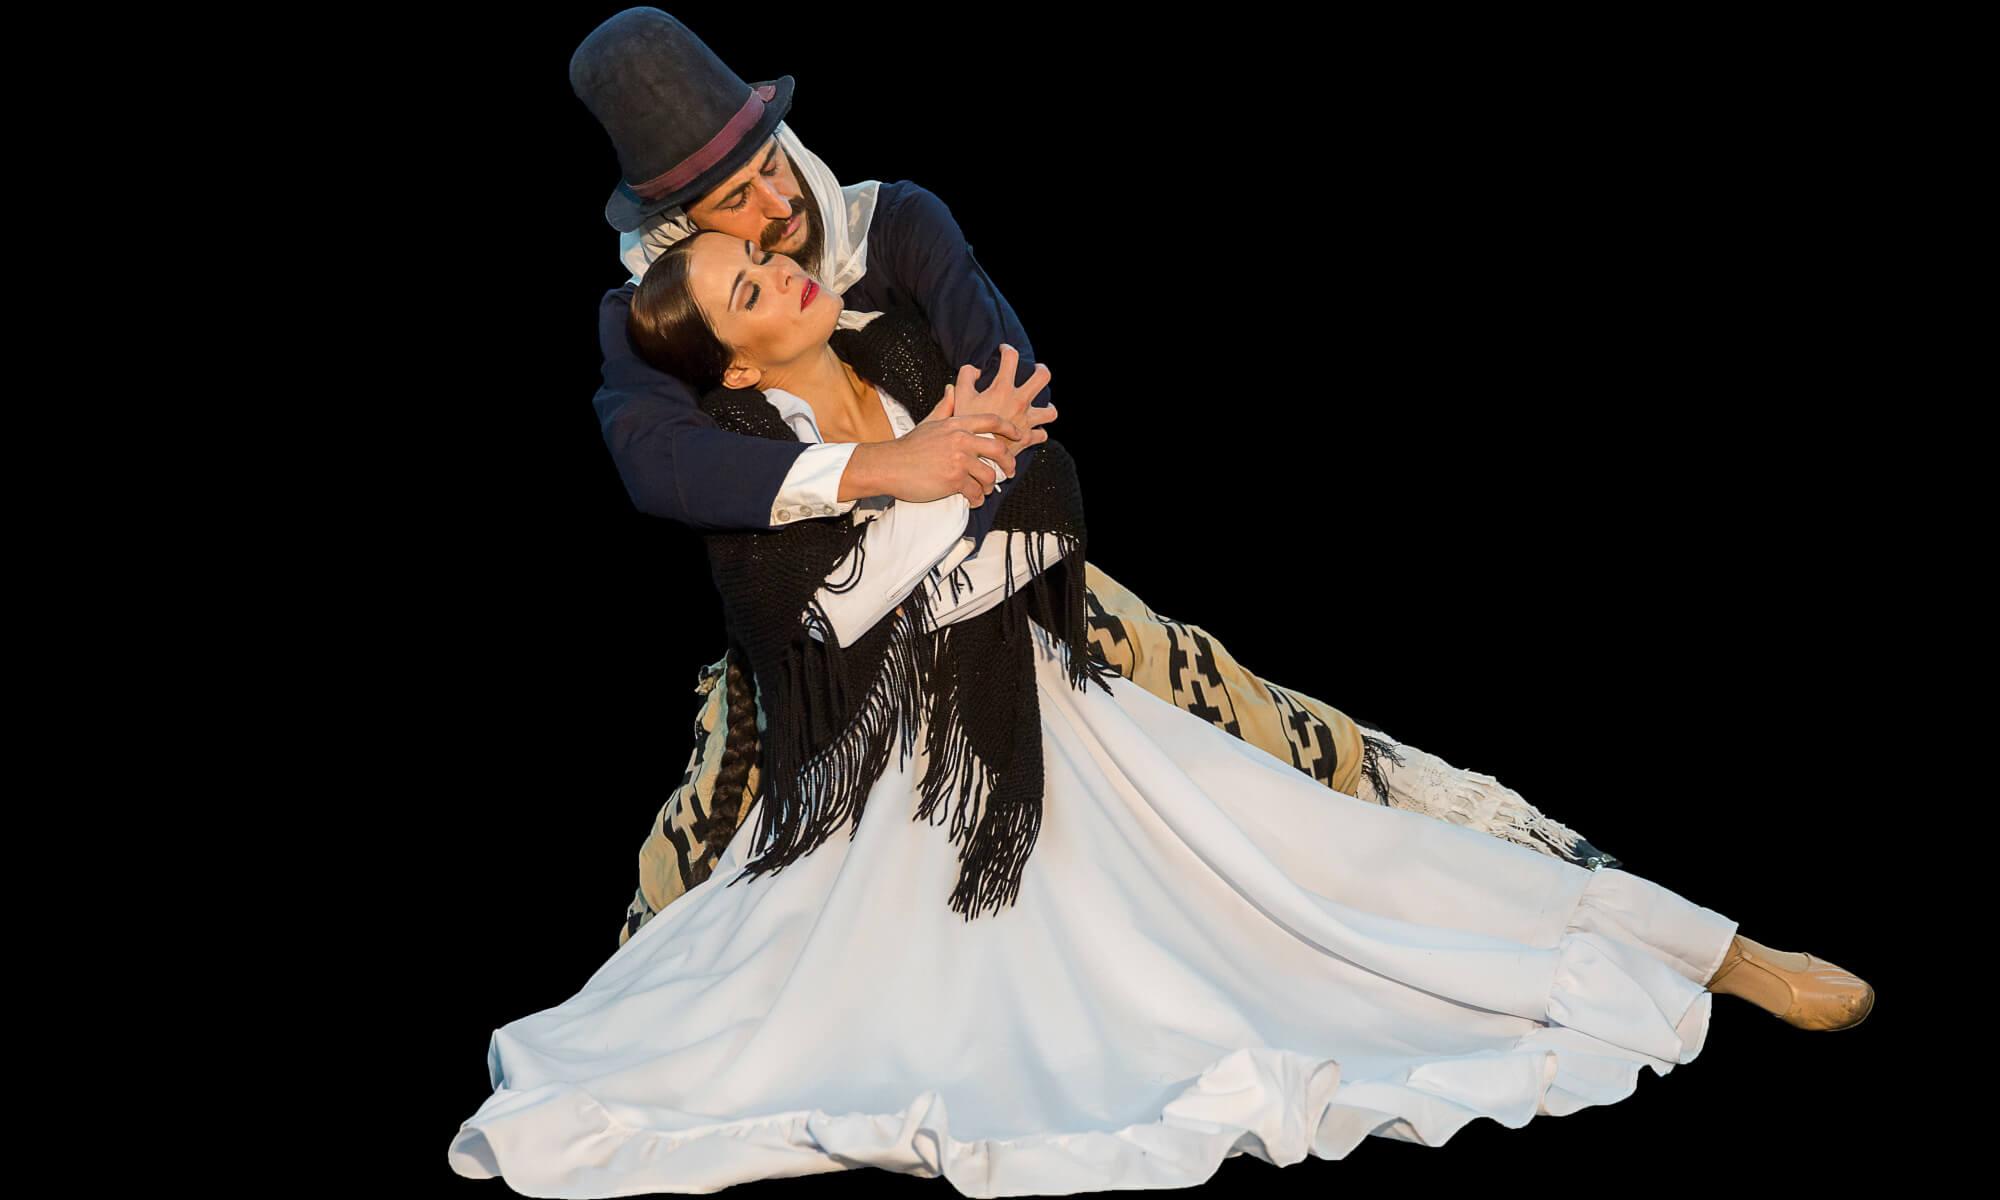 ballet folklorico performance in dallas, texas